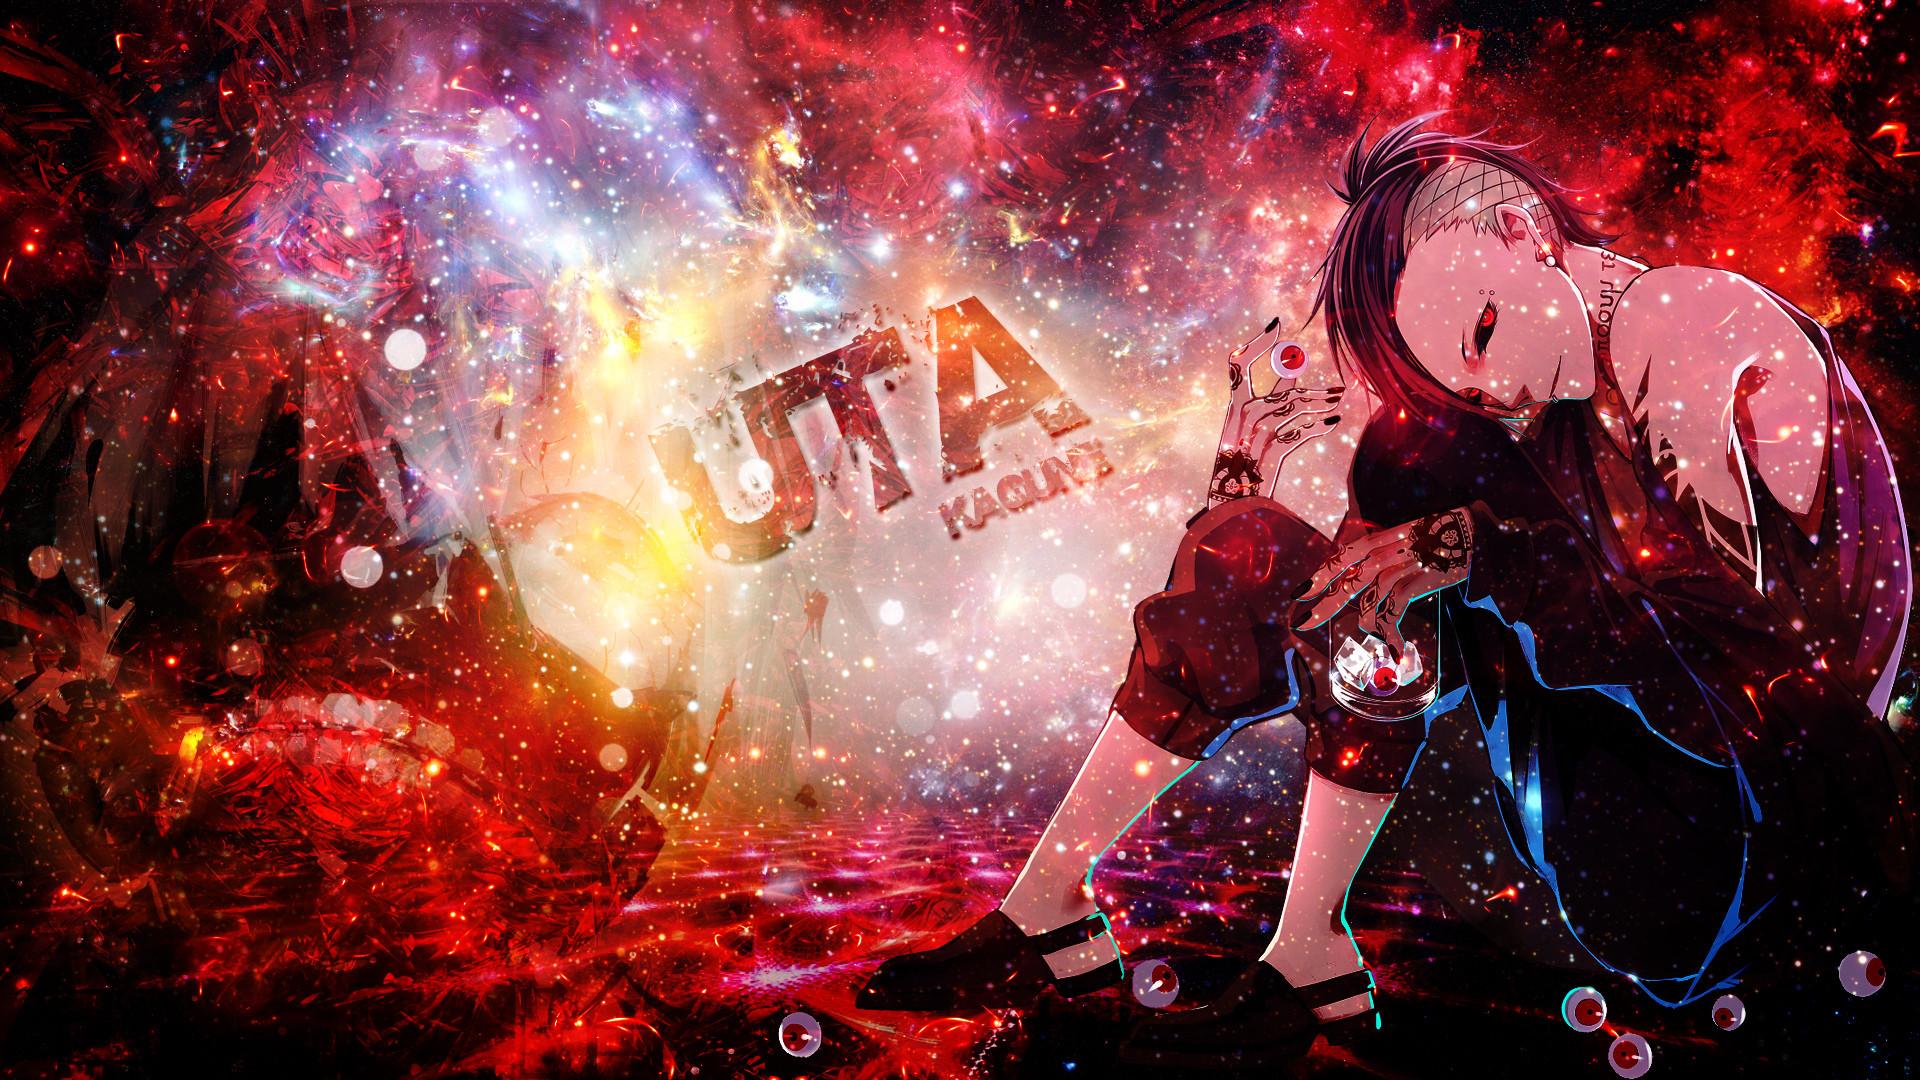 Uta tokyo ghoul wallpaper 72 images - Tokyo anime wallpaper ...